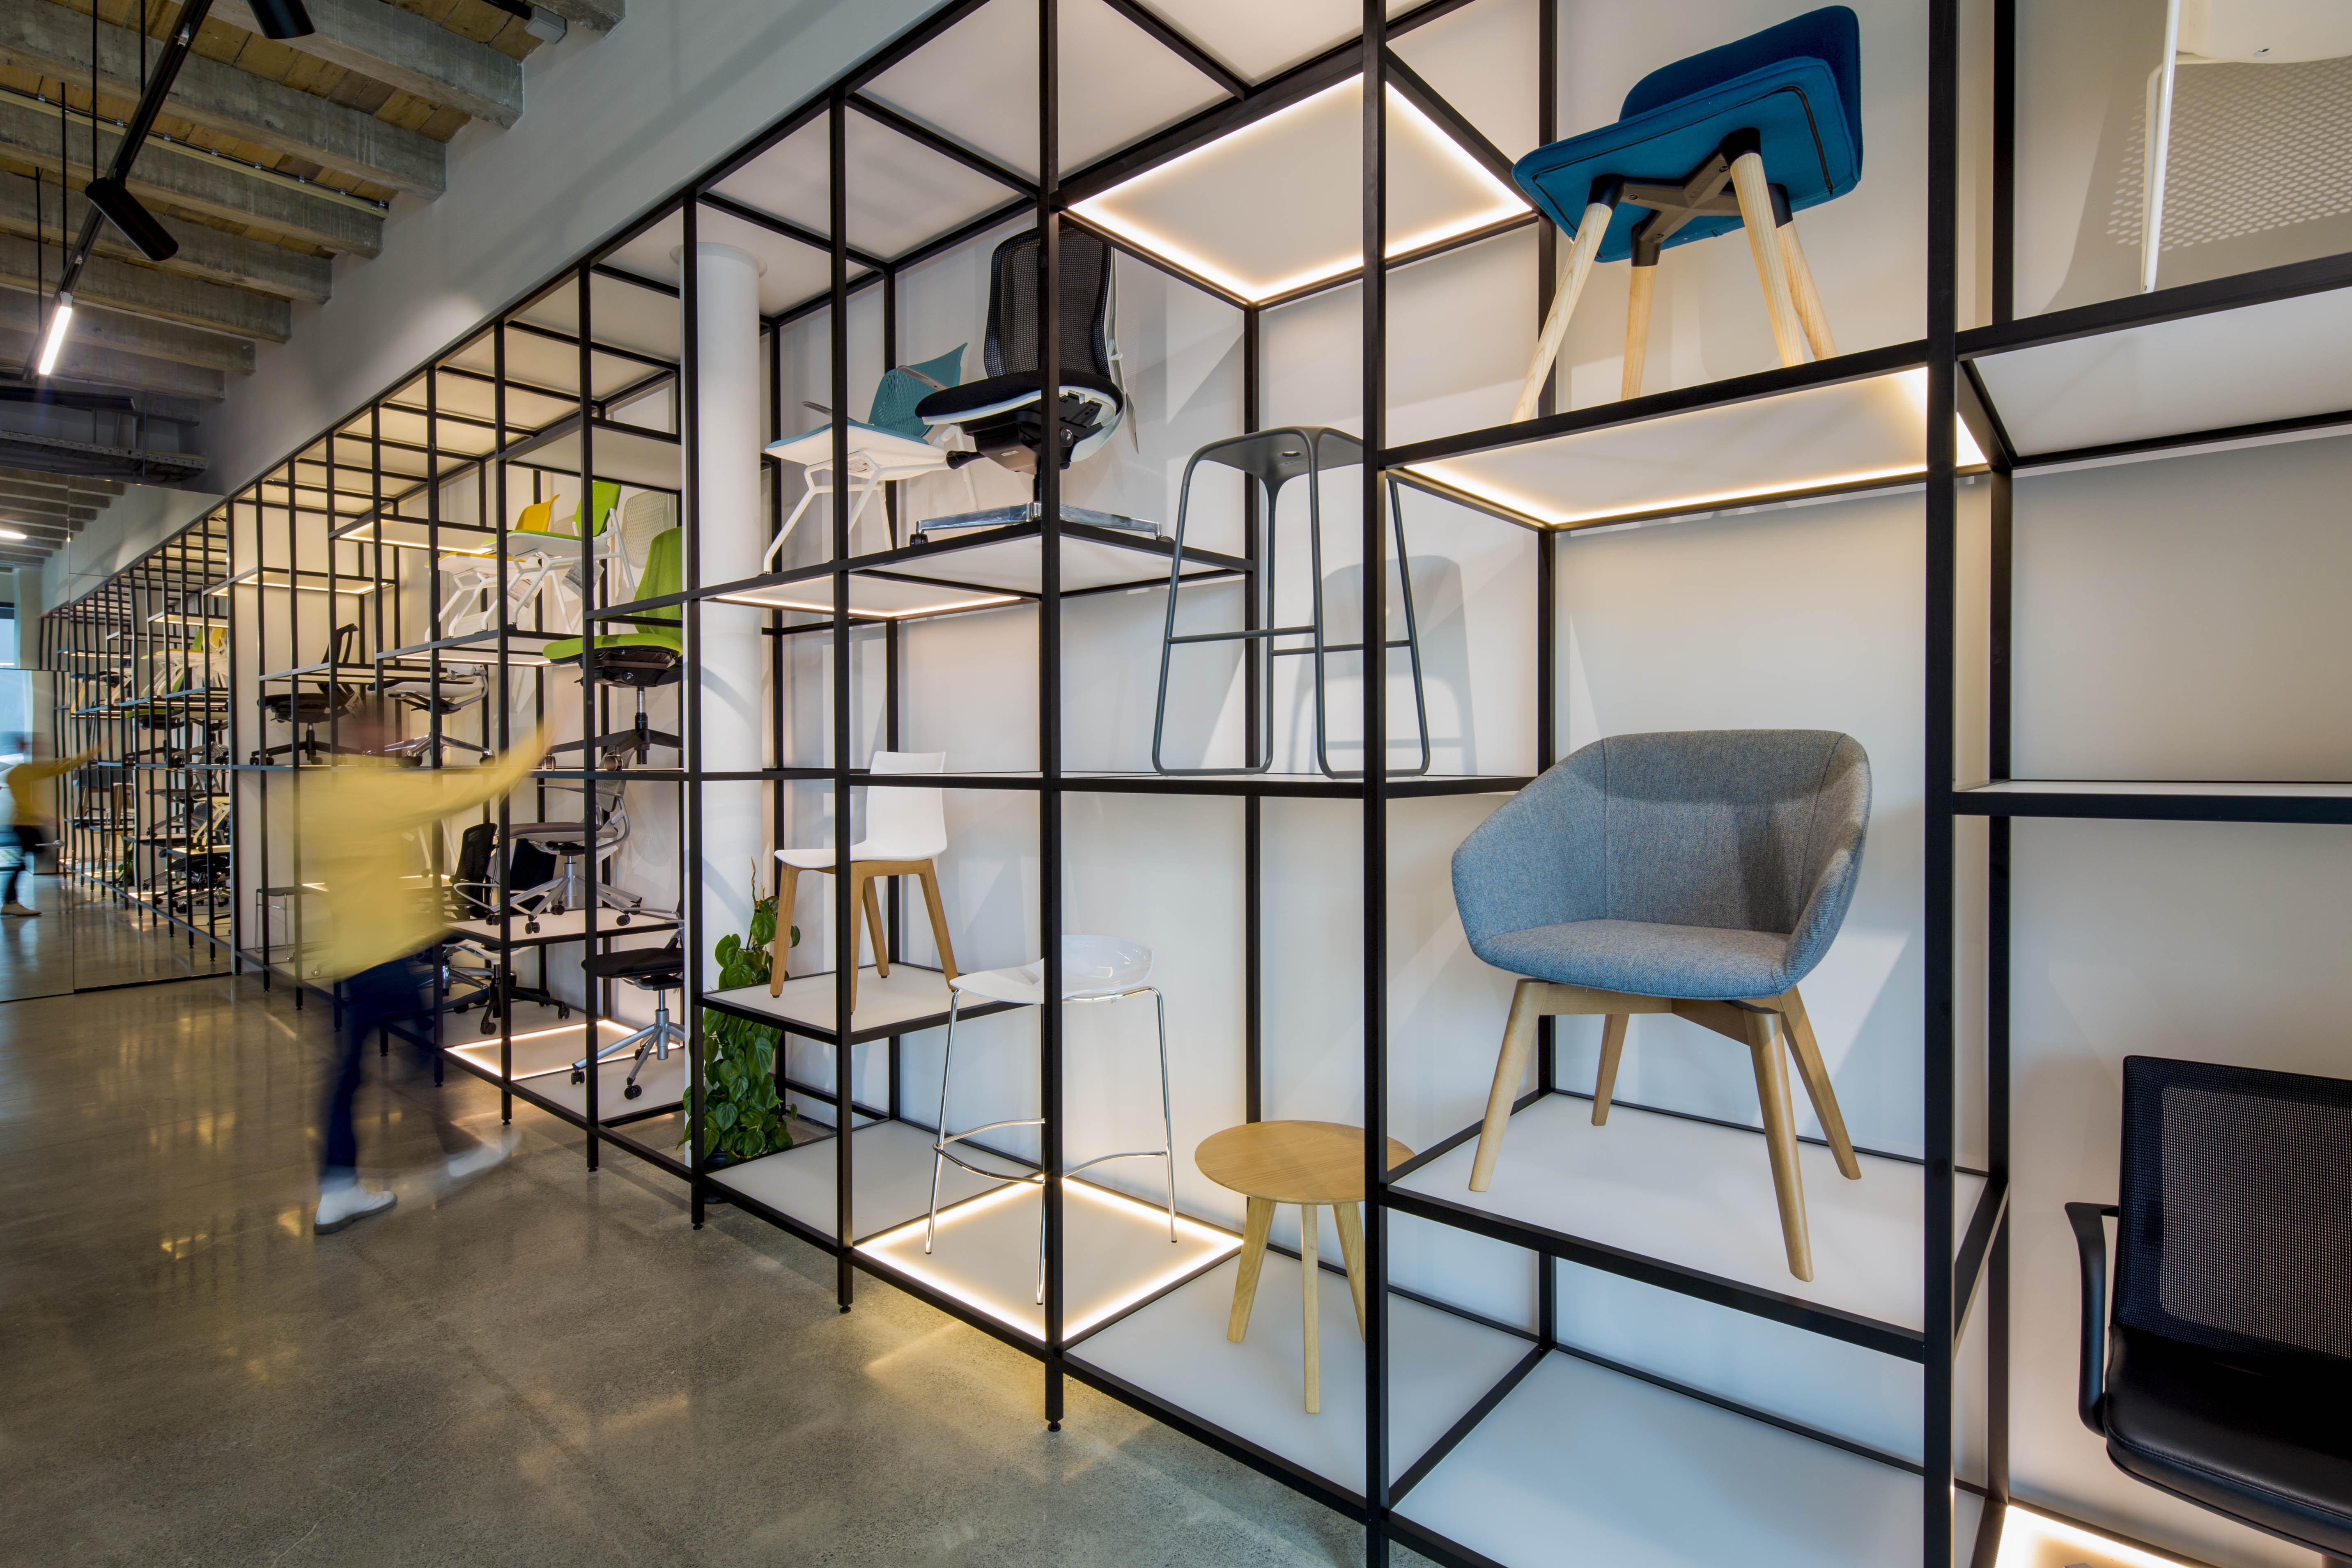 Interior Design Furniture Showrooms New Jersey ~ Aspect furniture showroom christchurch red awards